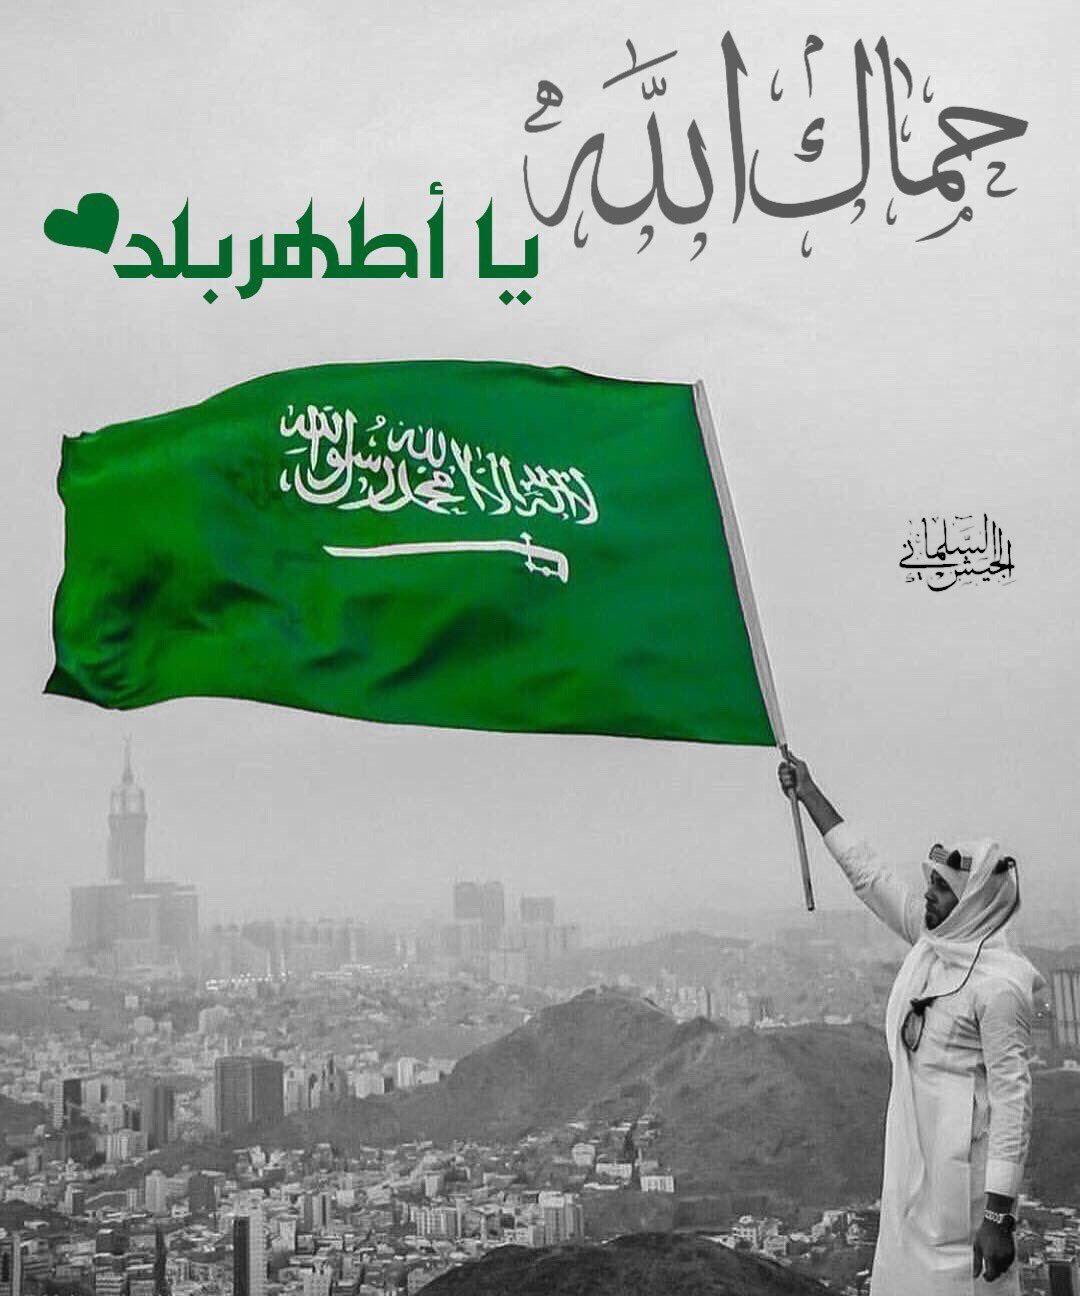 Pin By Albdr On دام عزك ياوطن National Day Saudi King Salman Saudi Arabia Ksa Saudi Arabia